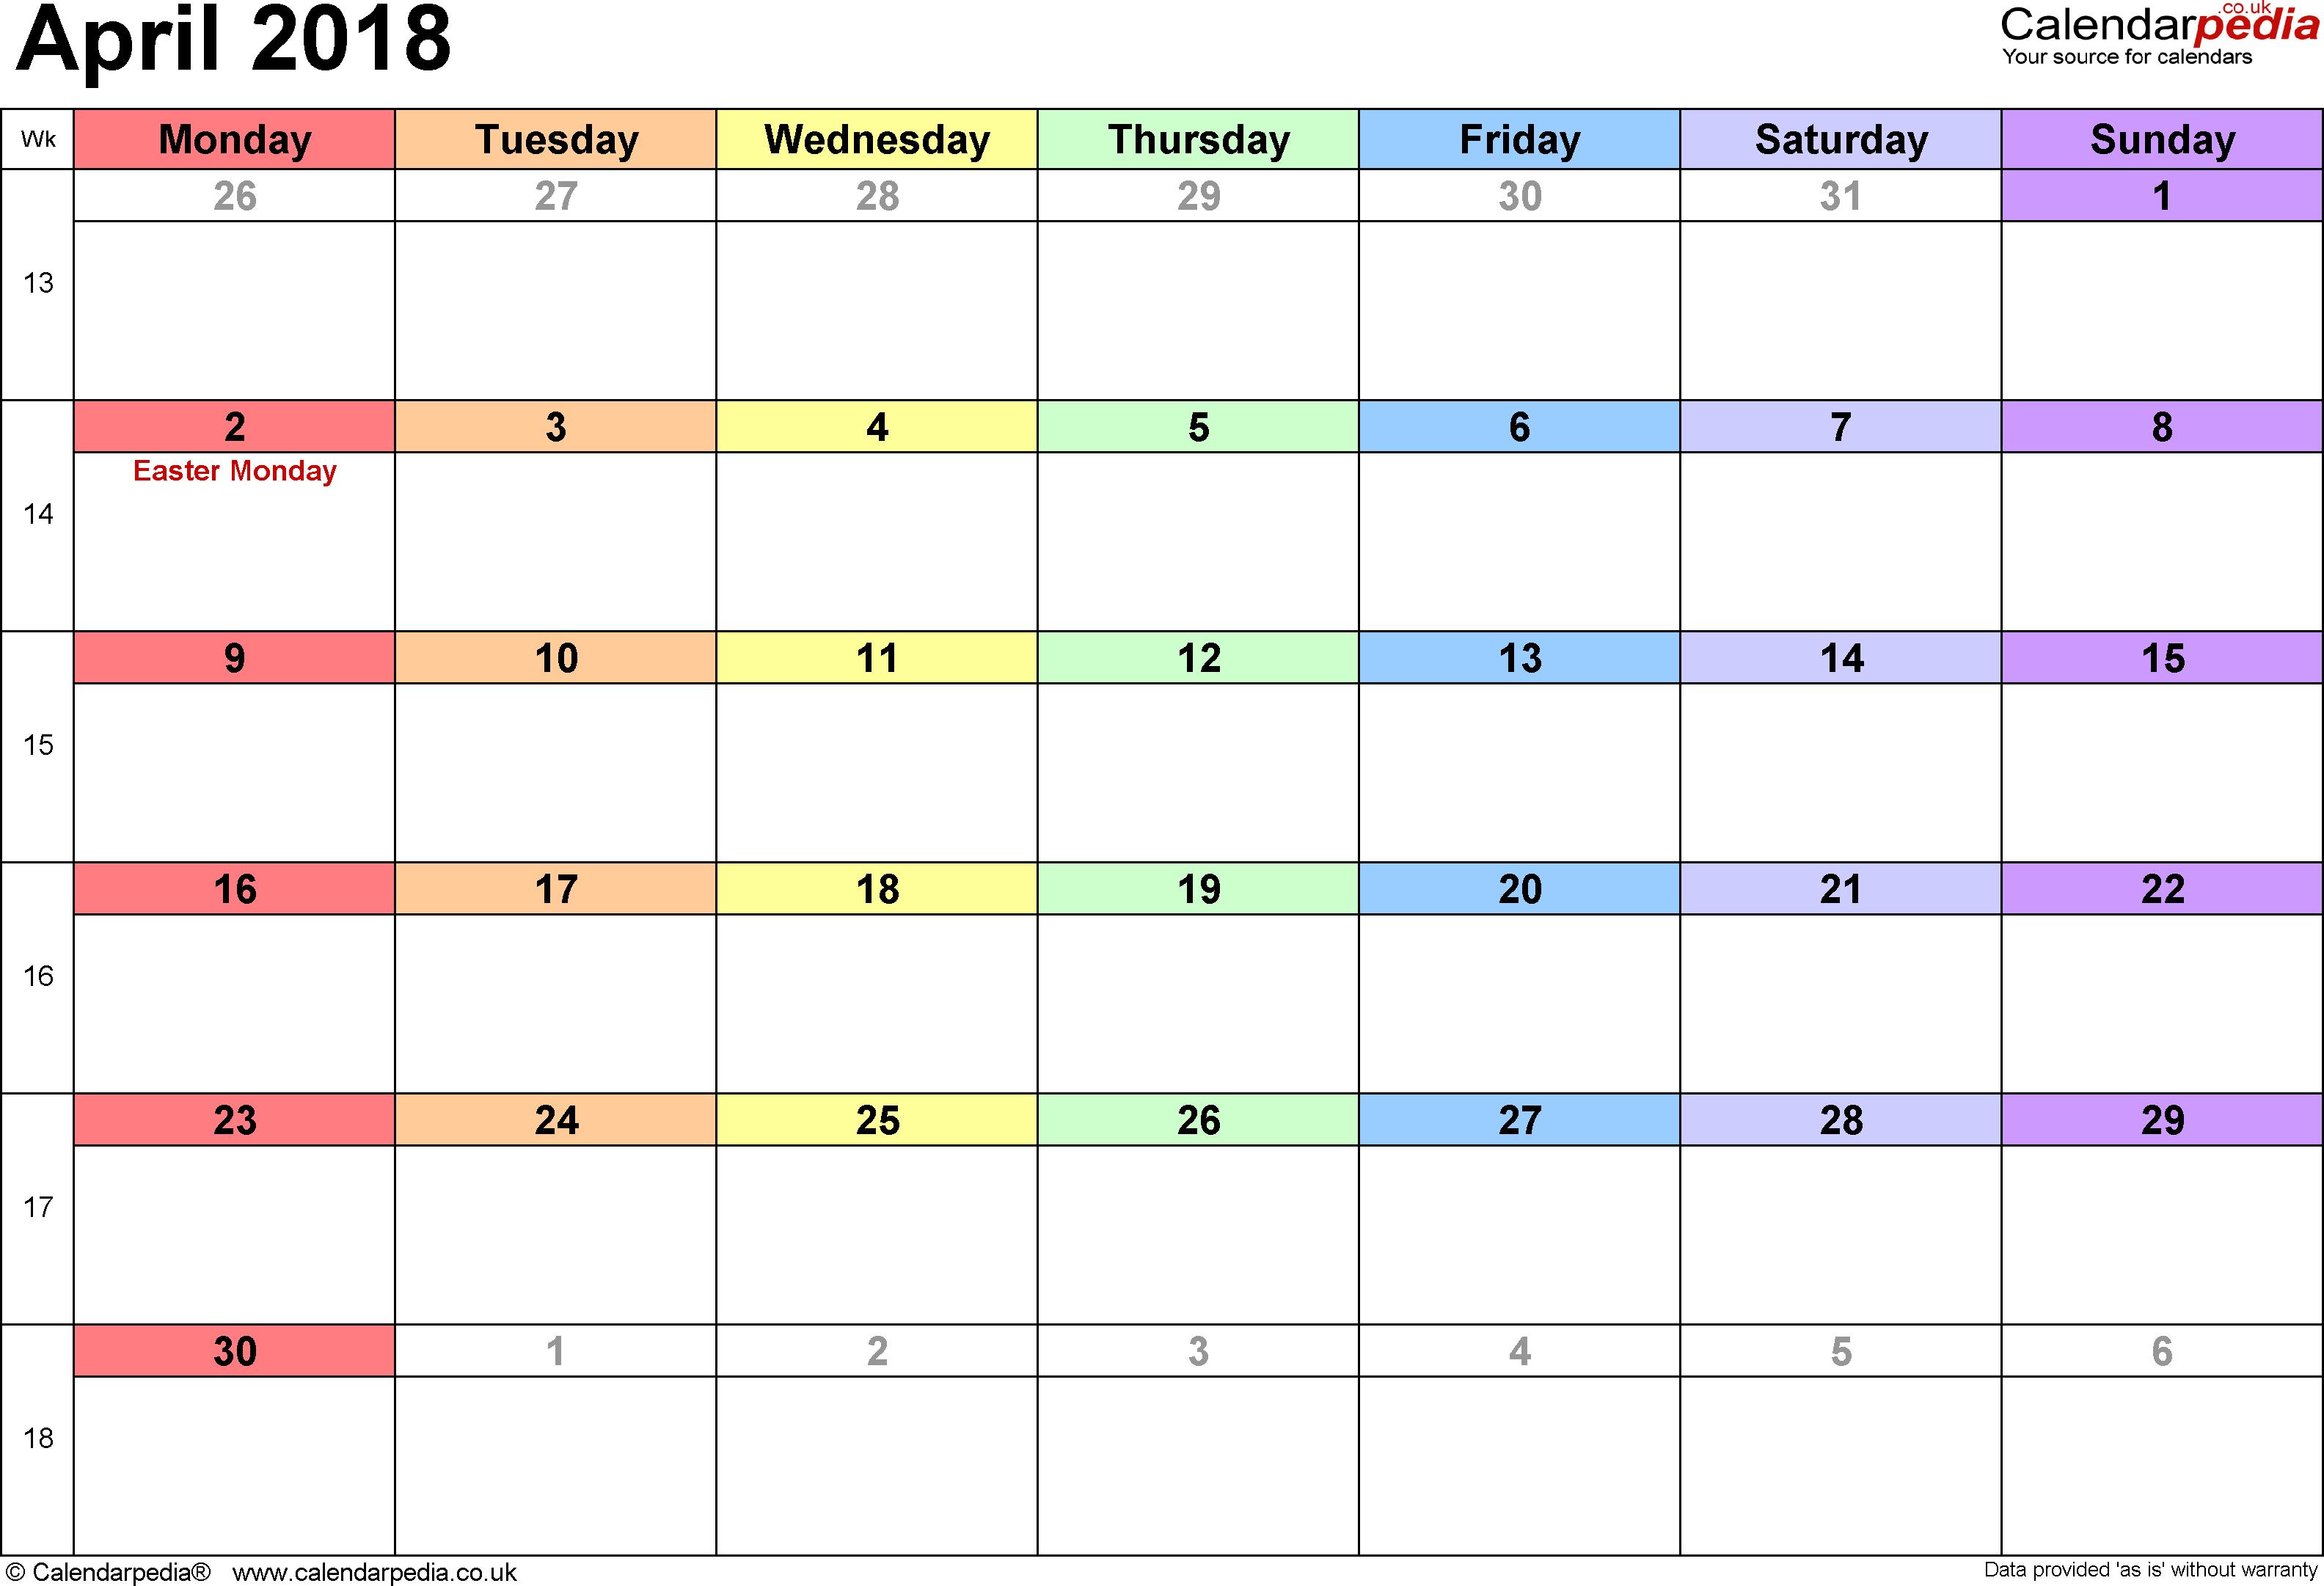 Calendar April 2018Calendar April 2018Calendar April 2018